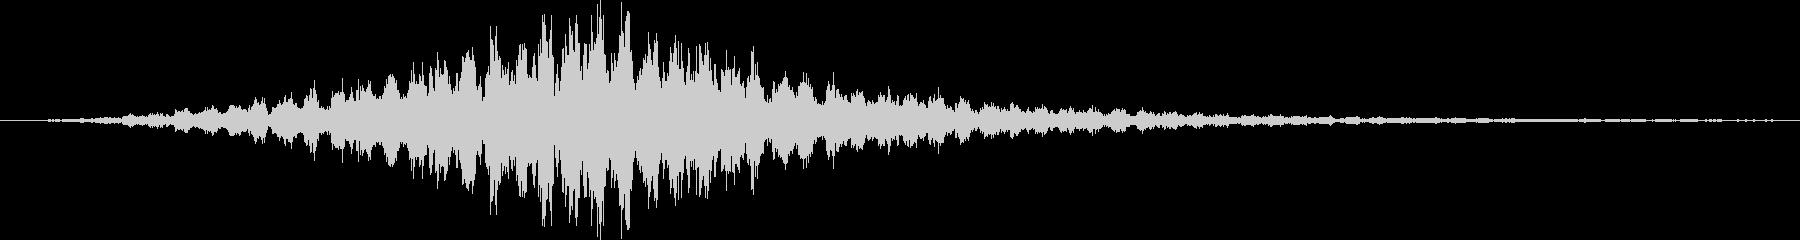 ポリポリポリポリポリポリホ…の未再生の波形